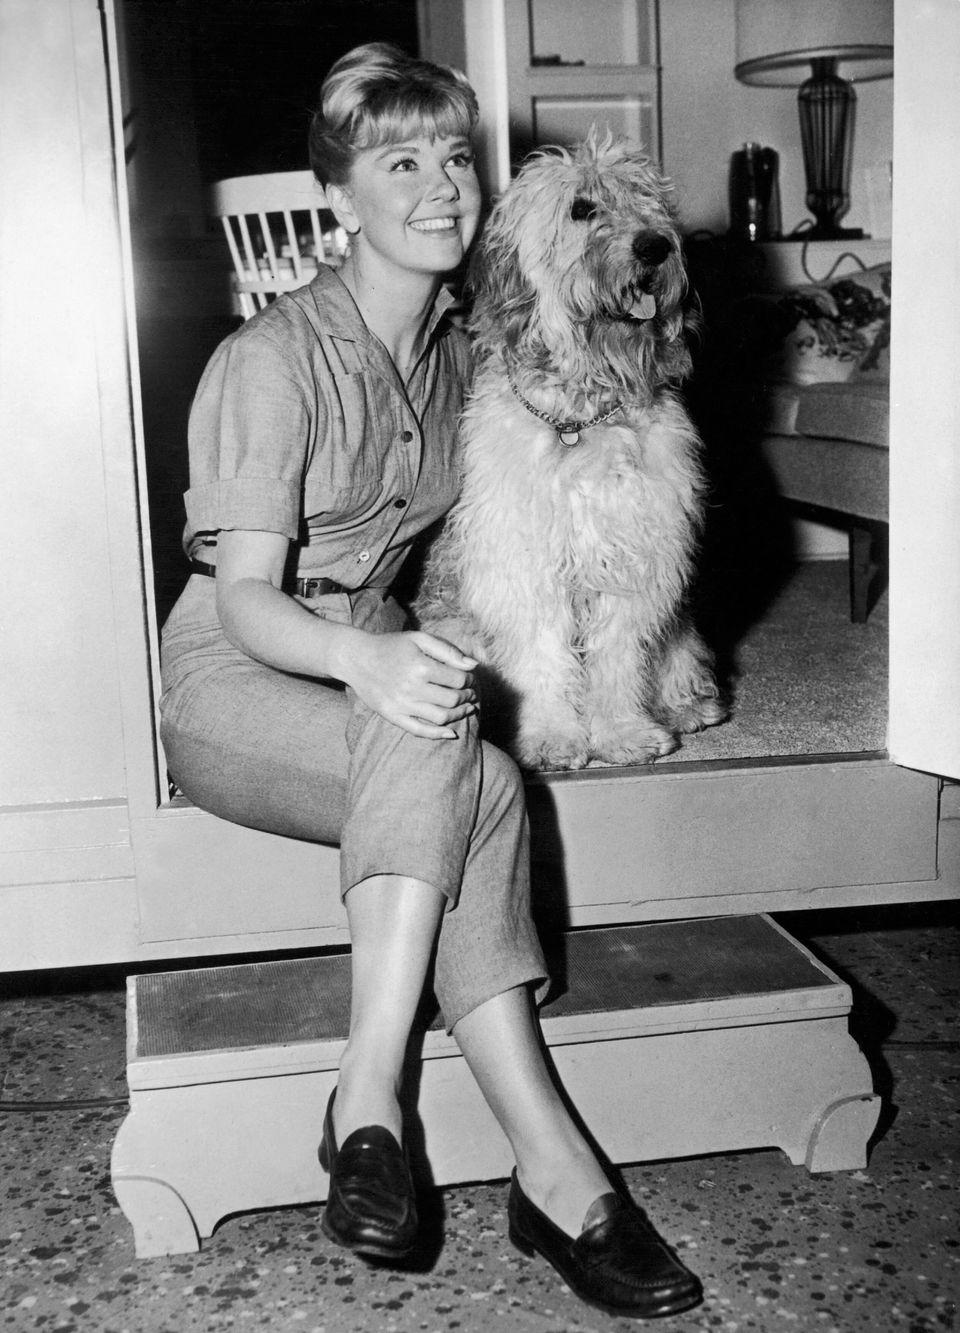 Westlake Legal Group 5cd980e024000059007e9e33 A Look Back At Doris Day's Life And Career In Photos